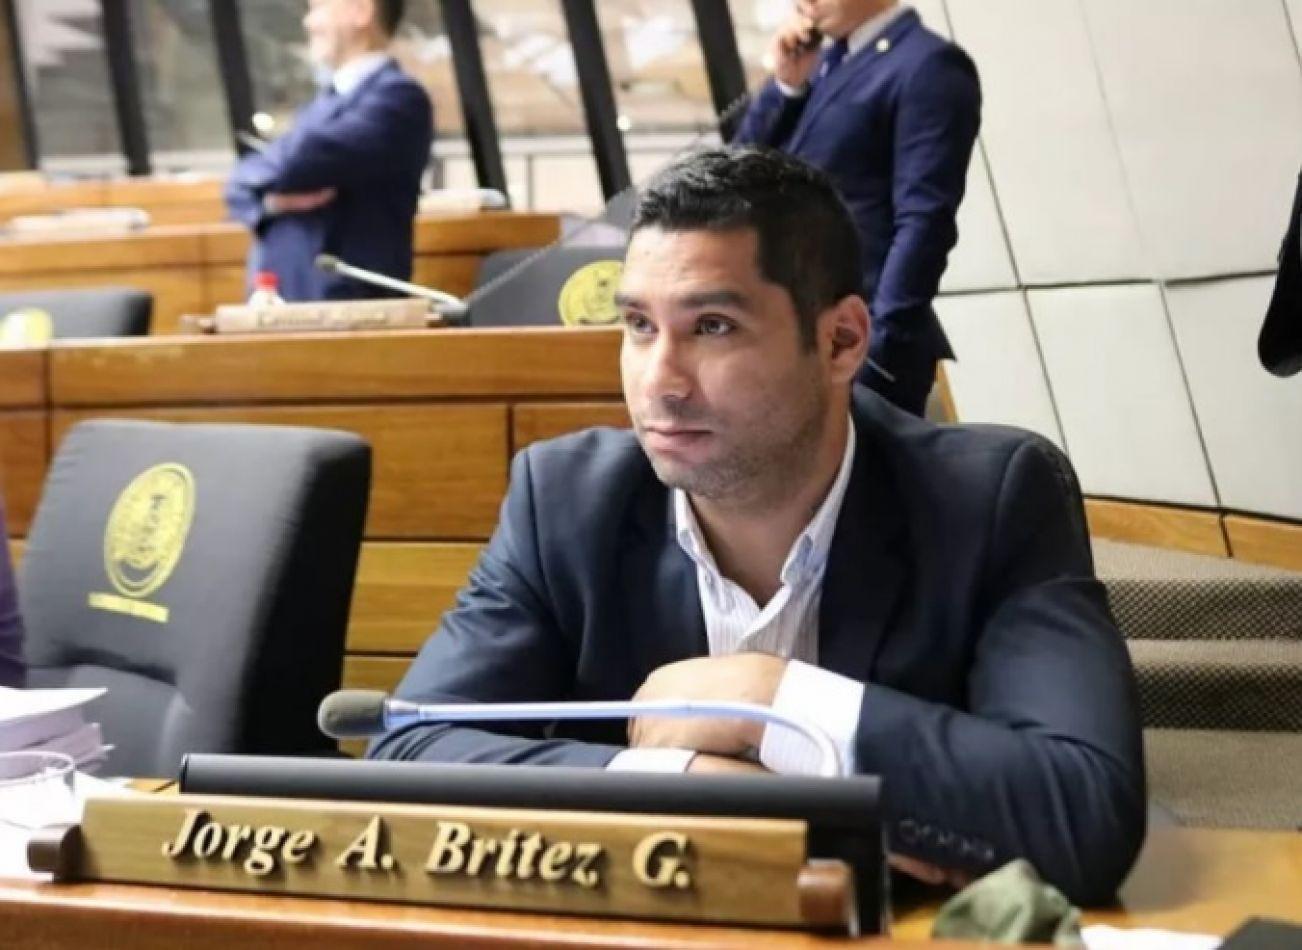 El diputado paraguayo, Jorge Brítez González manifestó una insólita idea acerca de los robos.